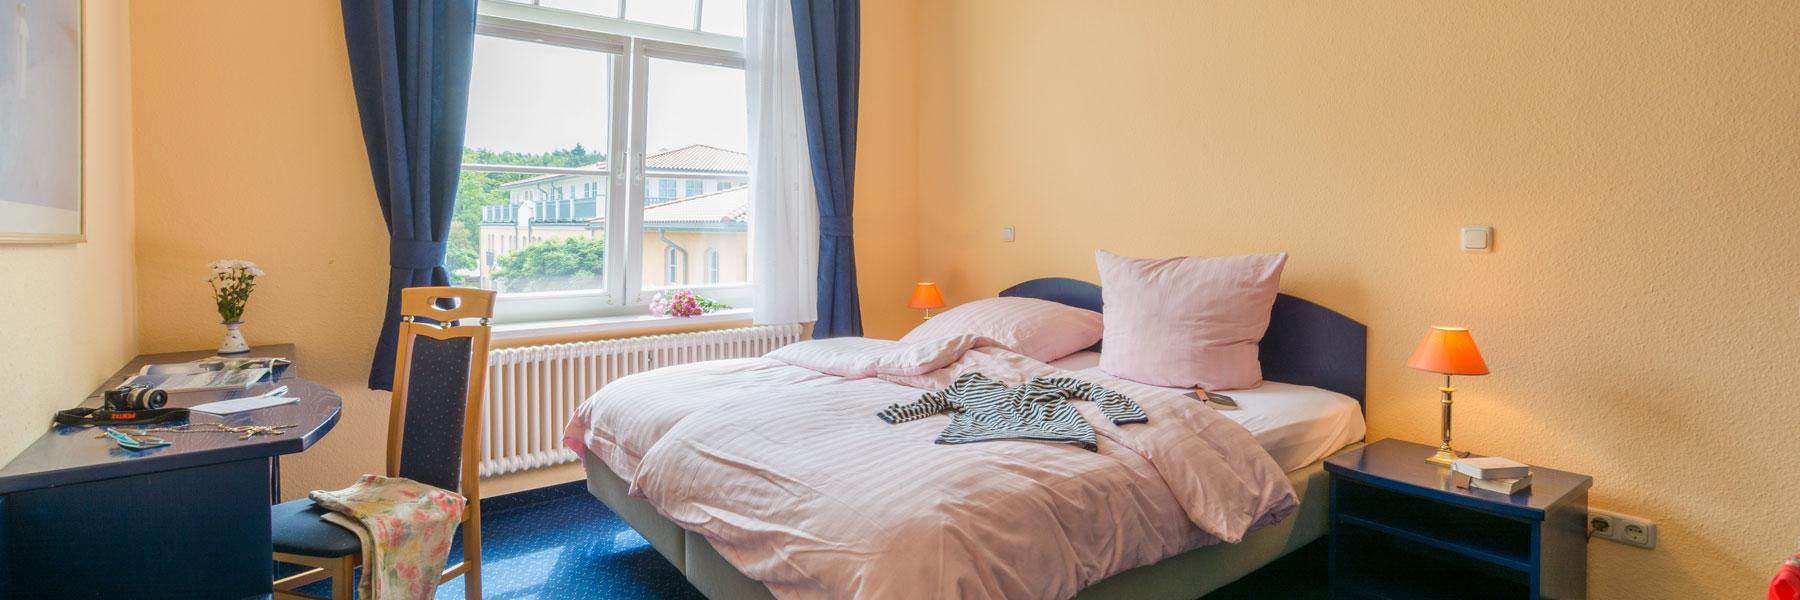 "2-Raum-Apartment - Apartmenthaus ""Villa Norden"""